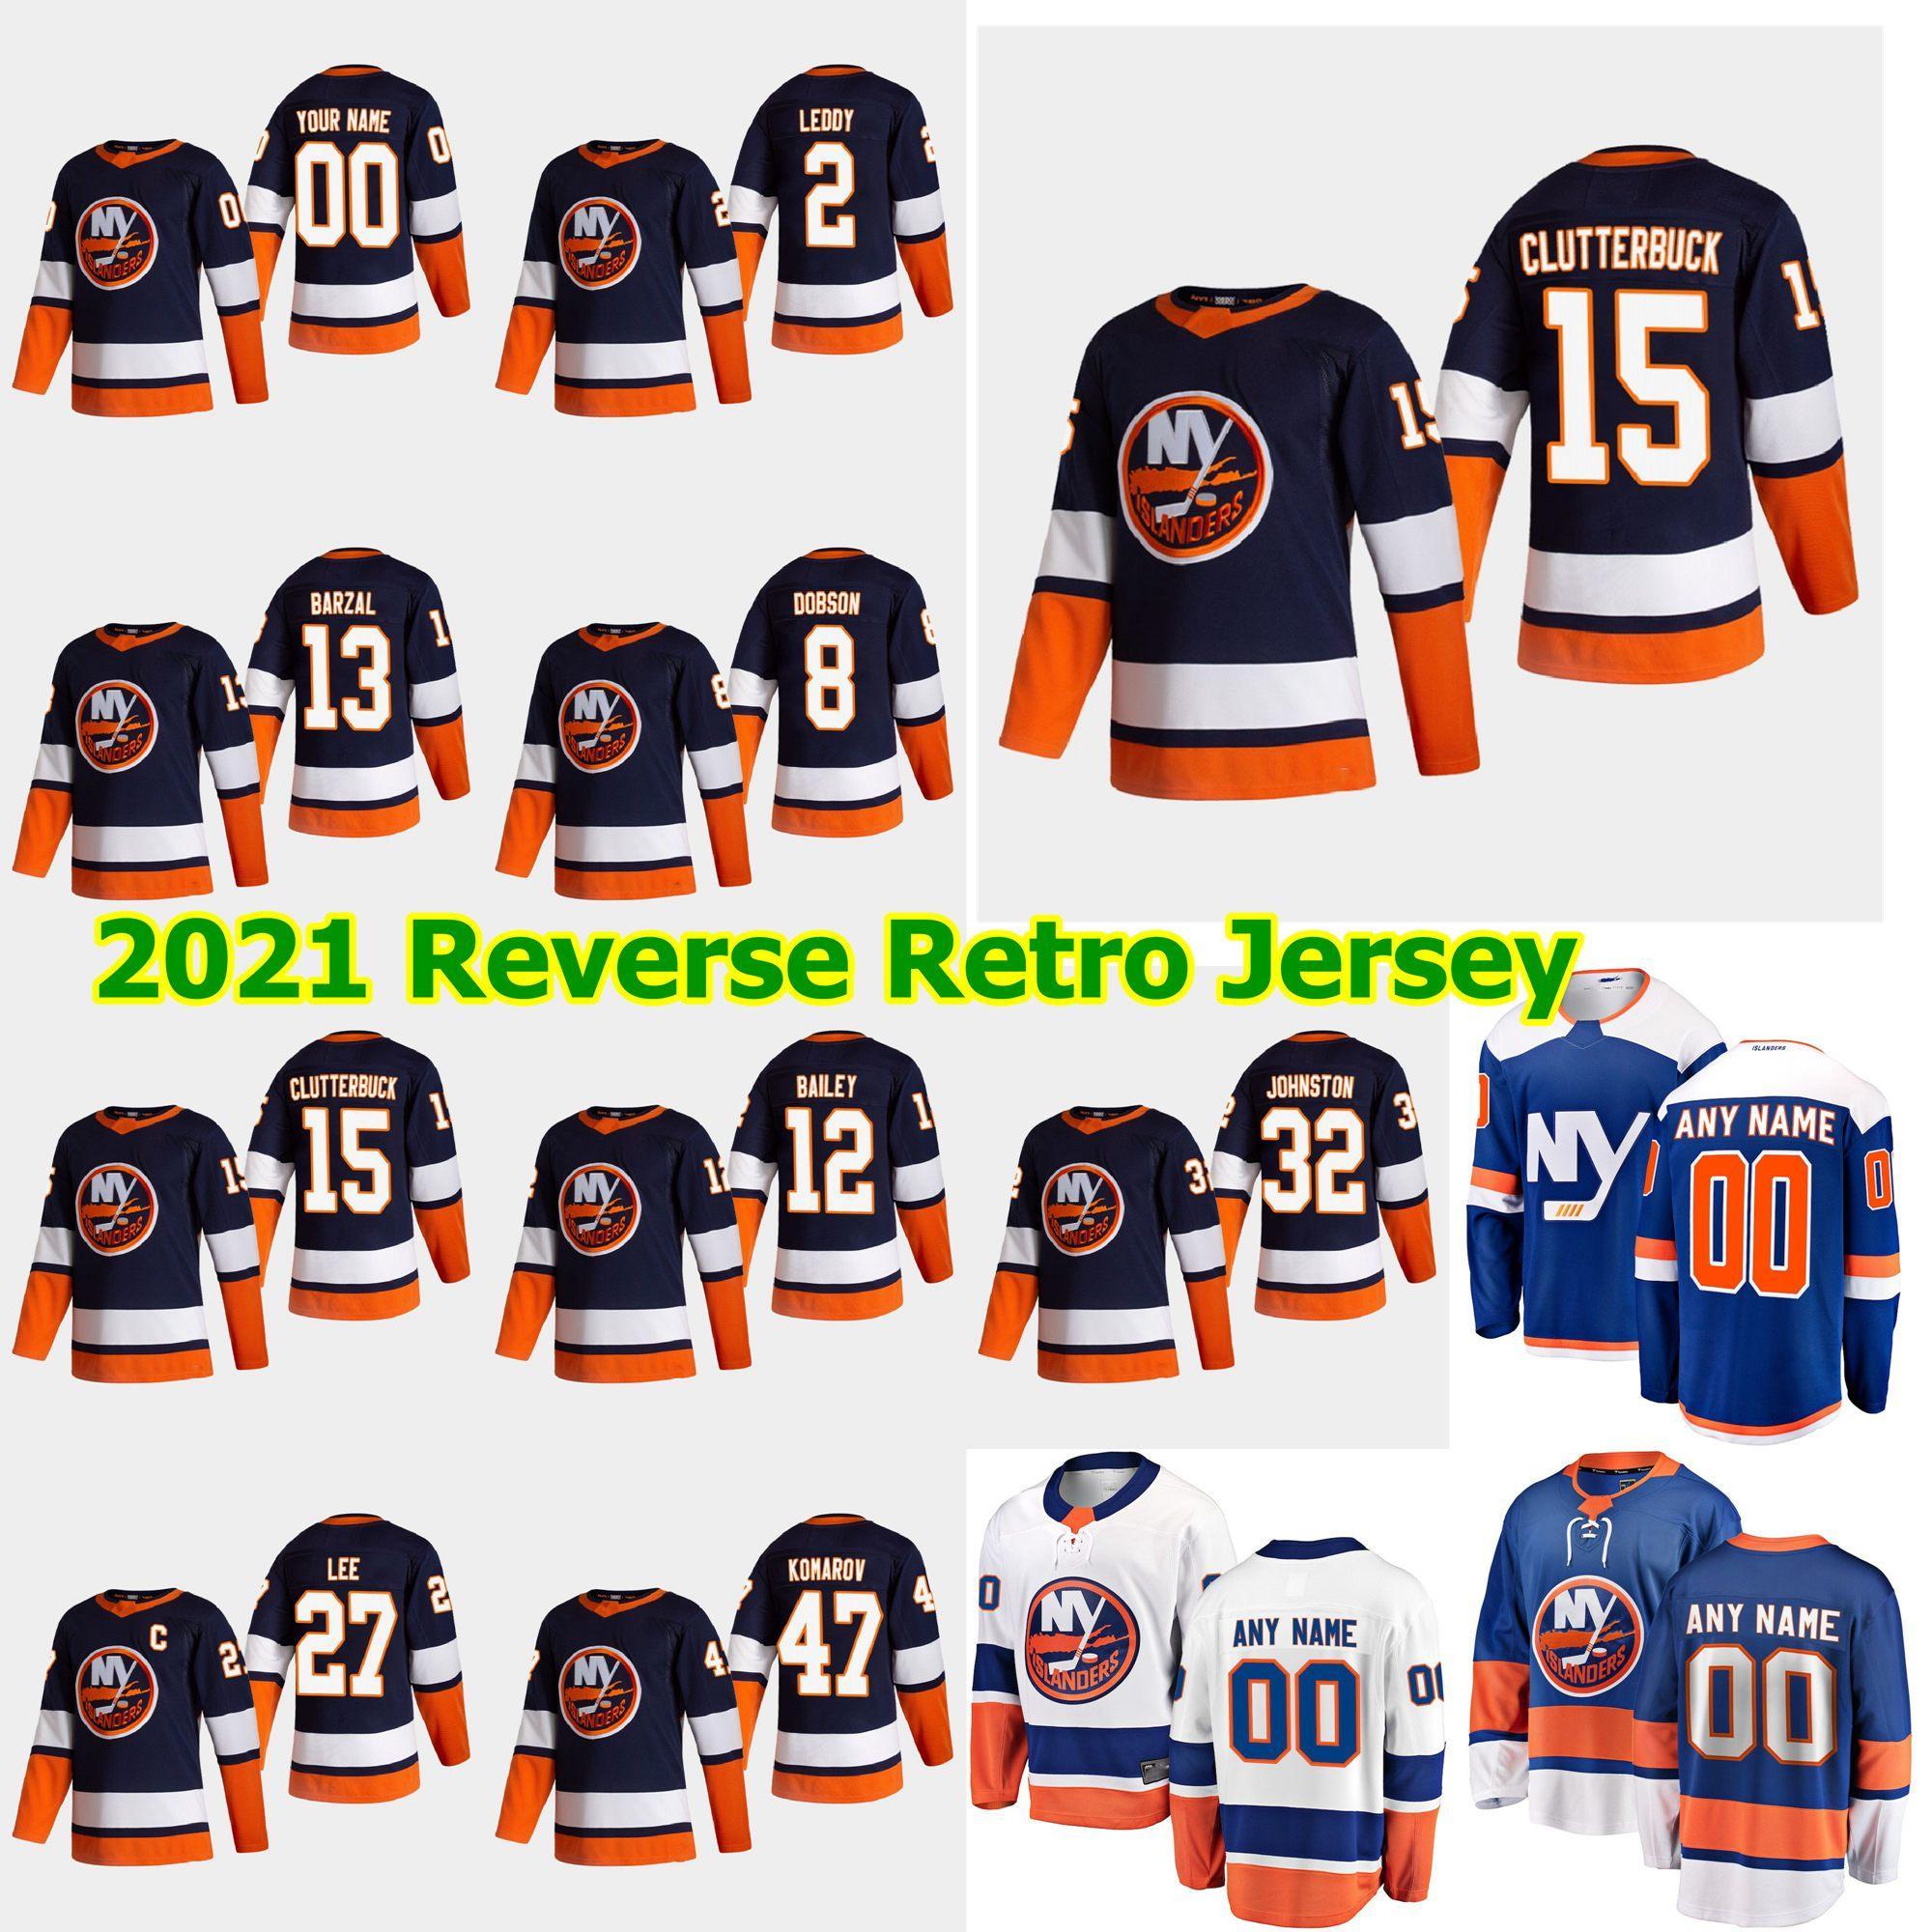 New York Islanders 2021 Retro Retro Hockey Jersey 2 Nick Leddy Jersey Scott Mayfield Casey Cizikas Michael Dal Colle Adam Pelech Custom